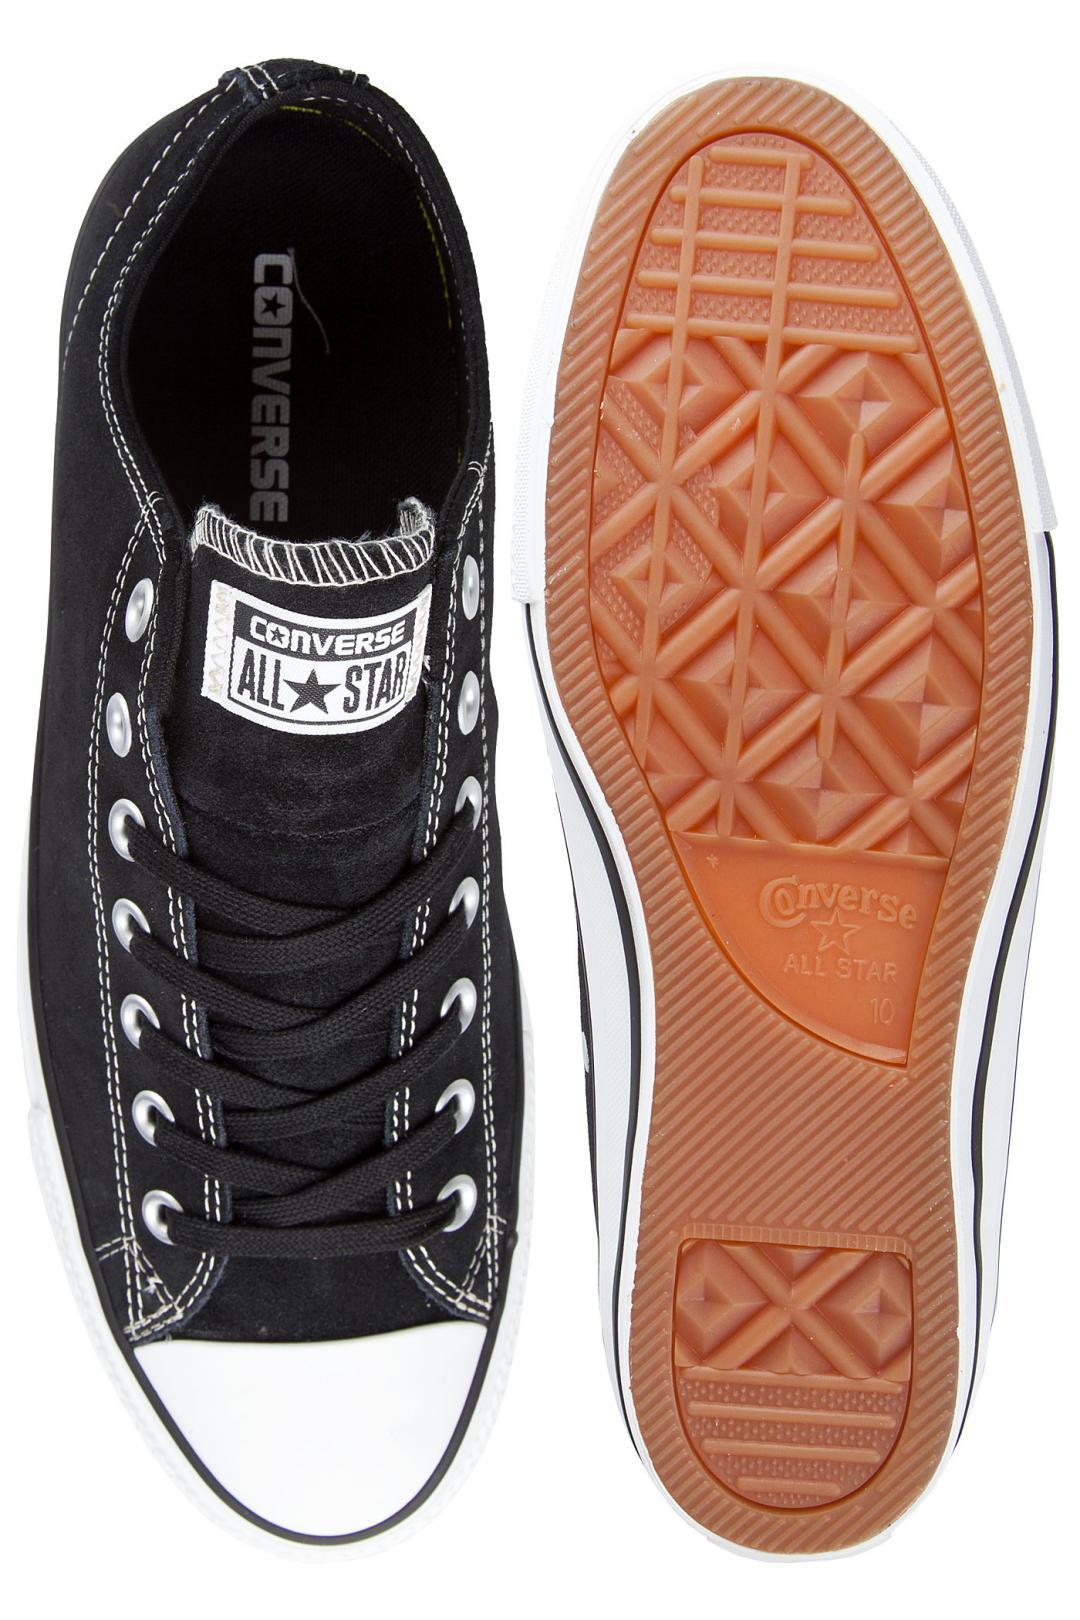 Uomo Converse CTAS Pro black white | Sneaker